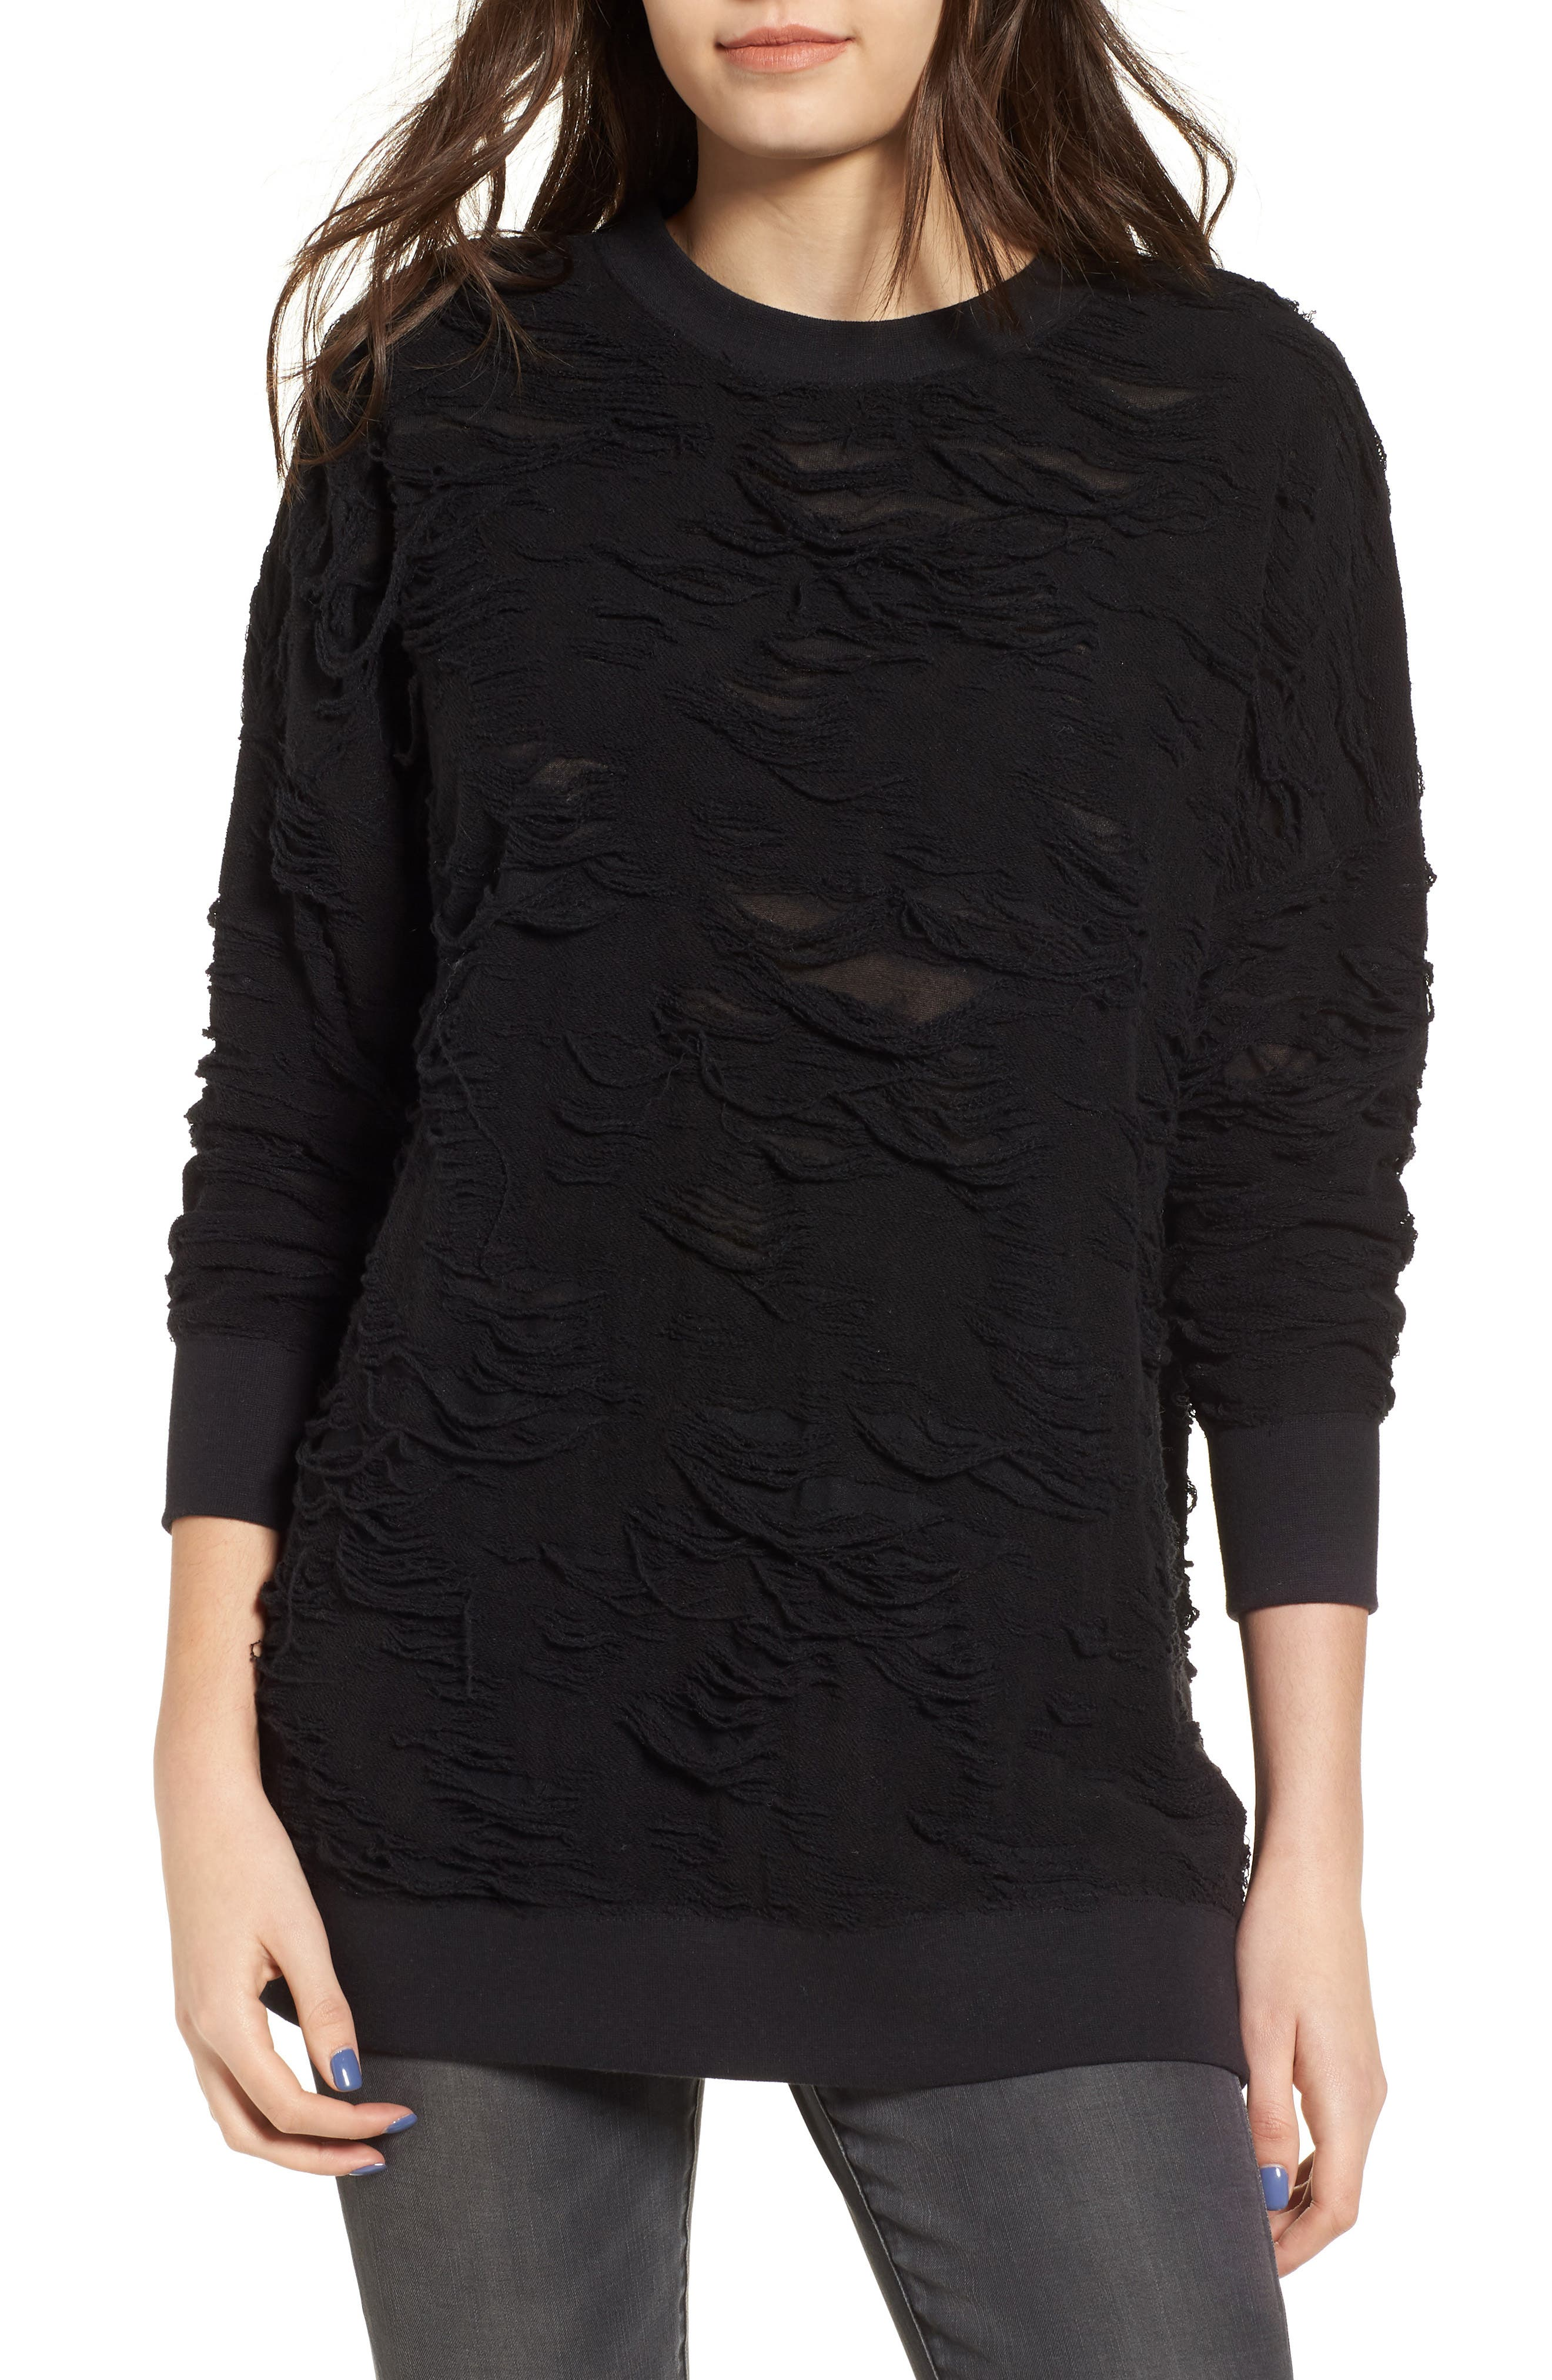 Me Too Slashed Sweatshirt,                         Main,                         color, Black